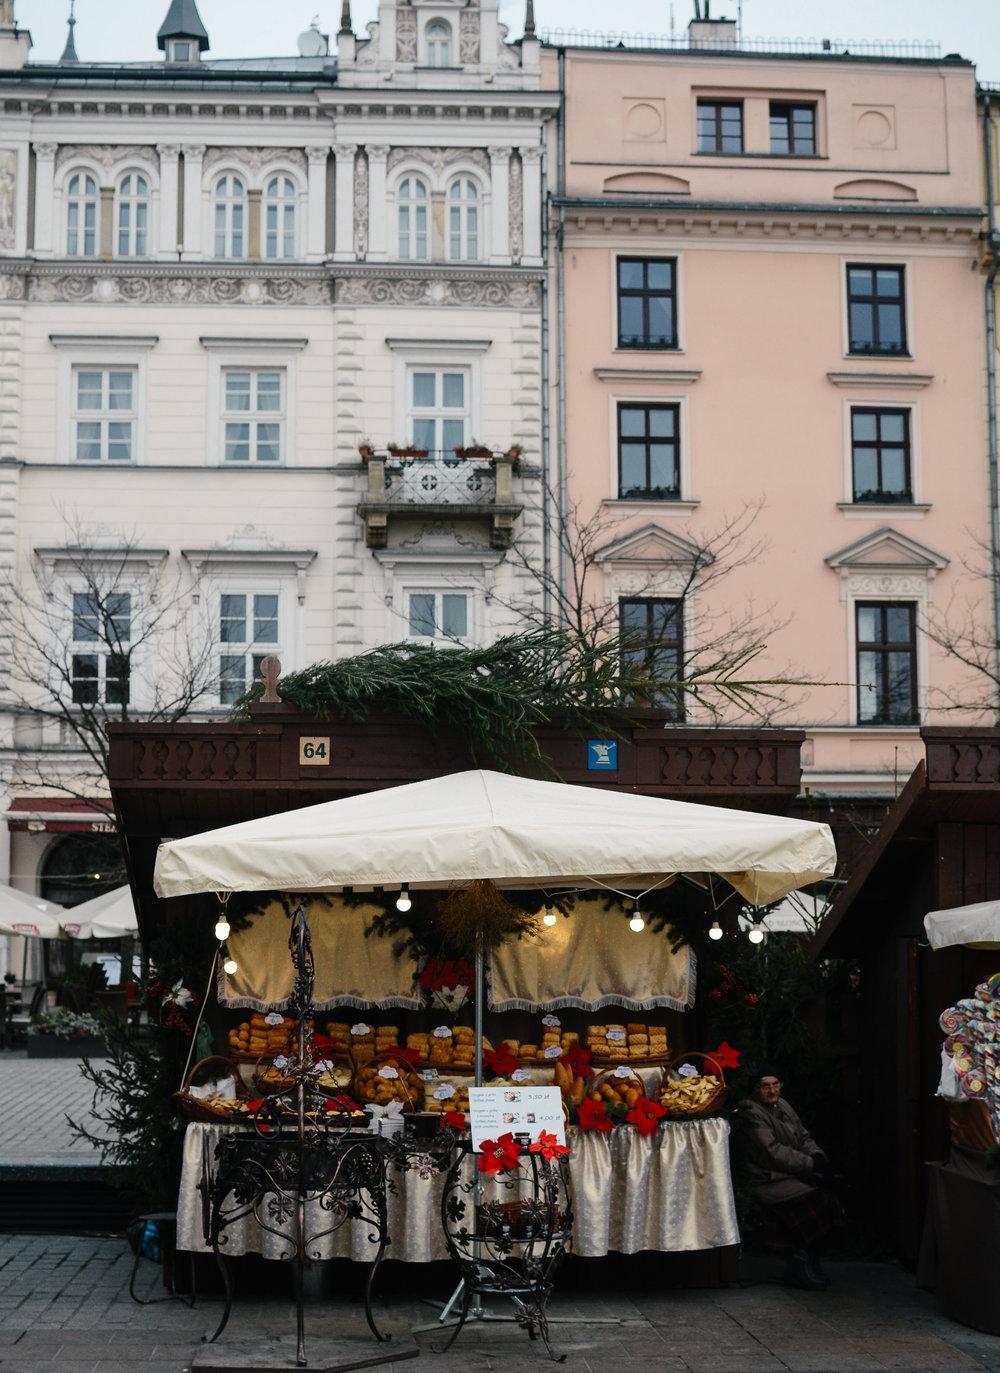 european-christmas-market-travel-guide-lifeonpine_DSC_0829.jpg